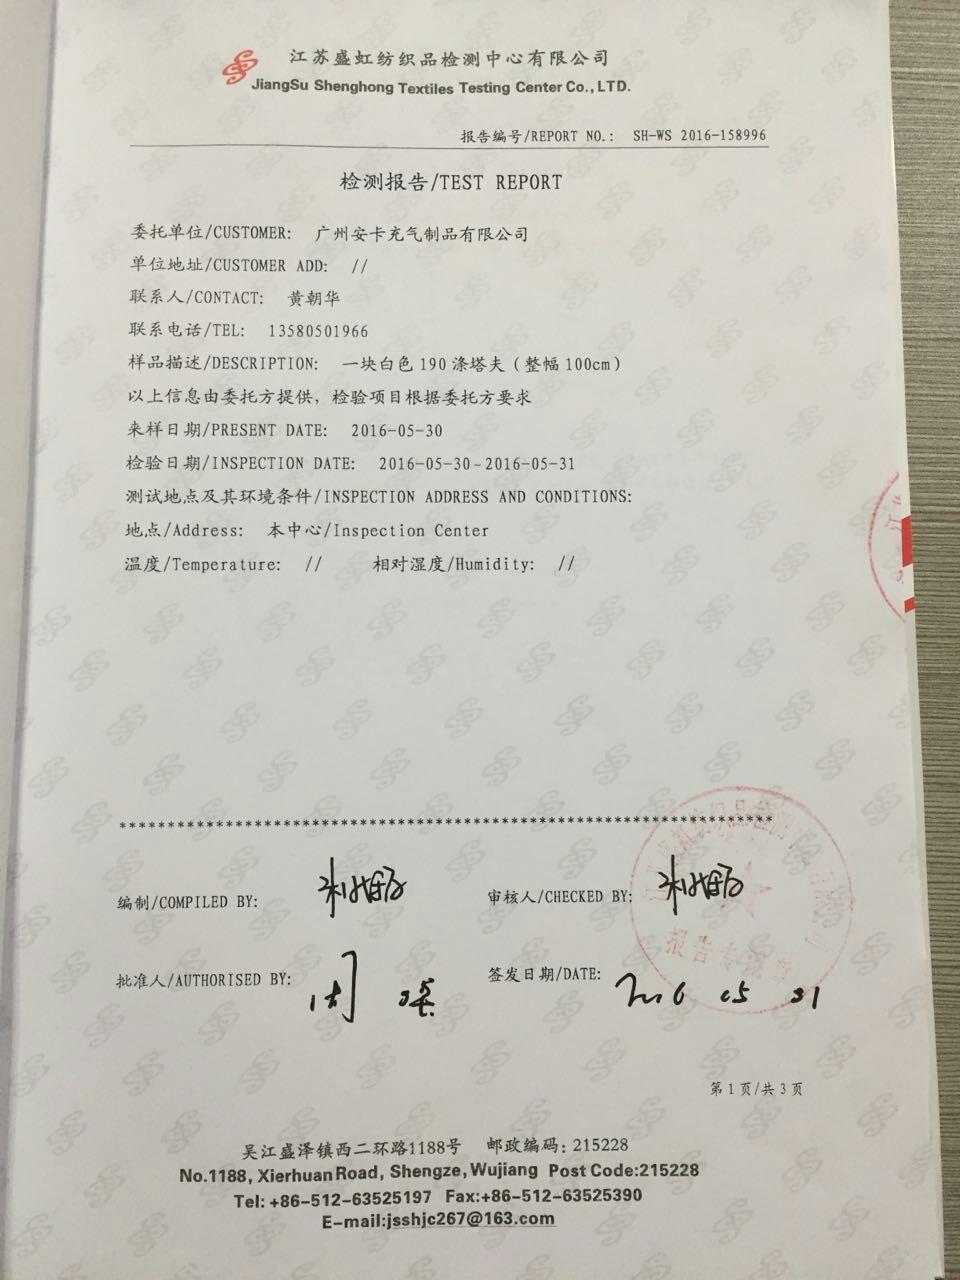 190D oxford nylon fire retardant--test report